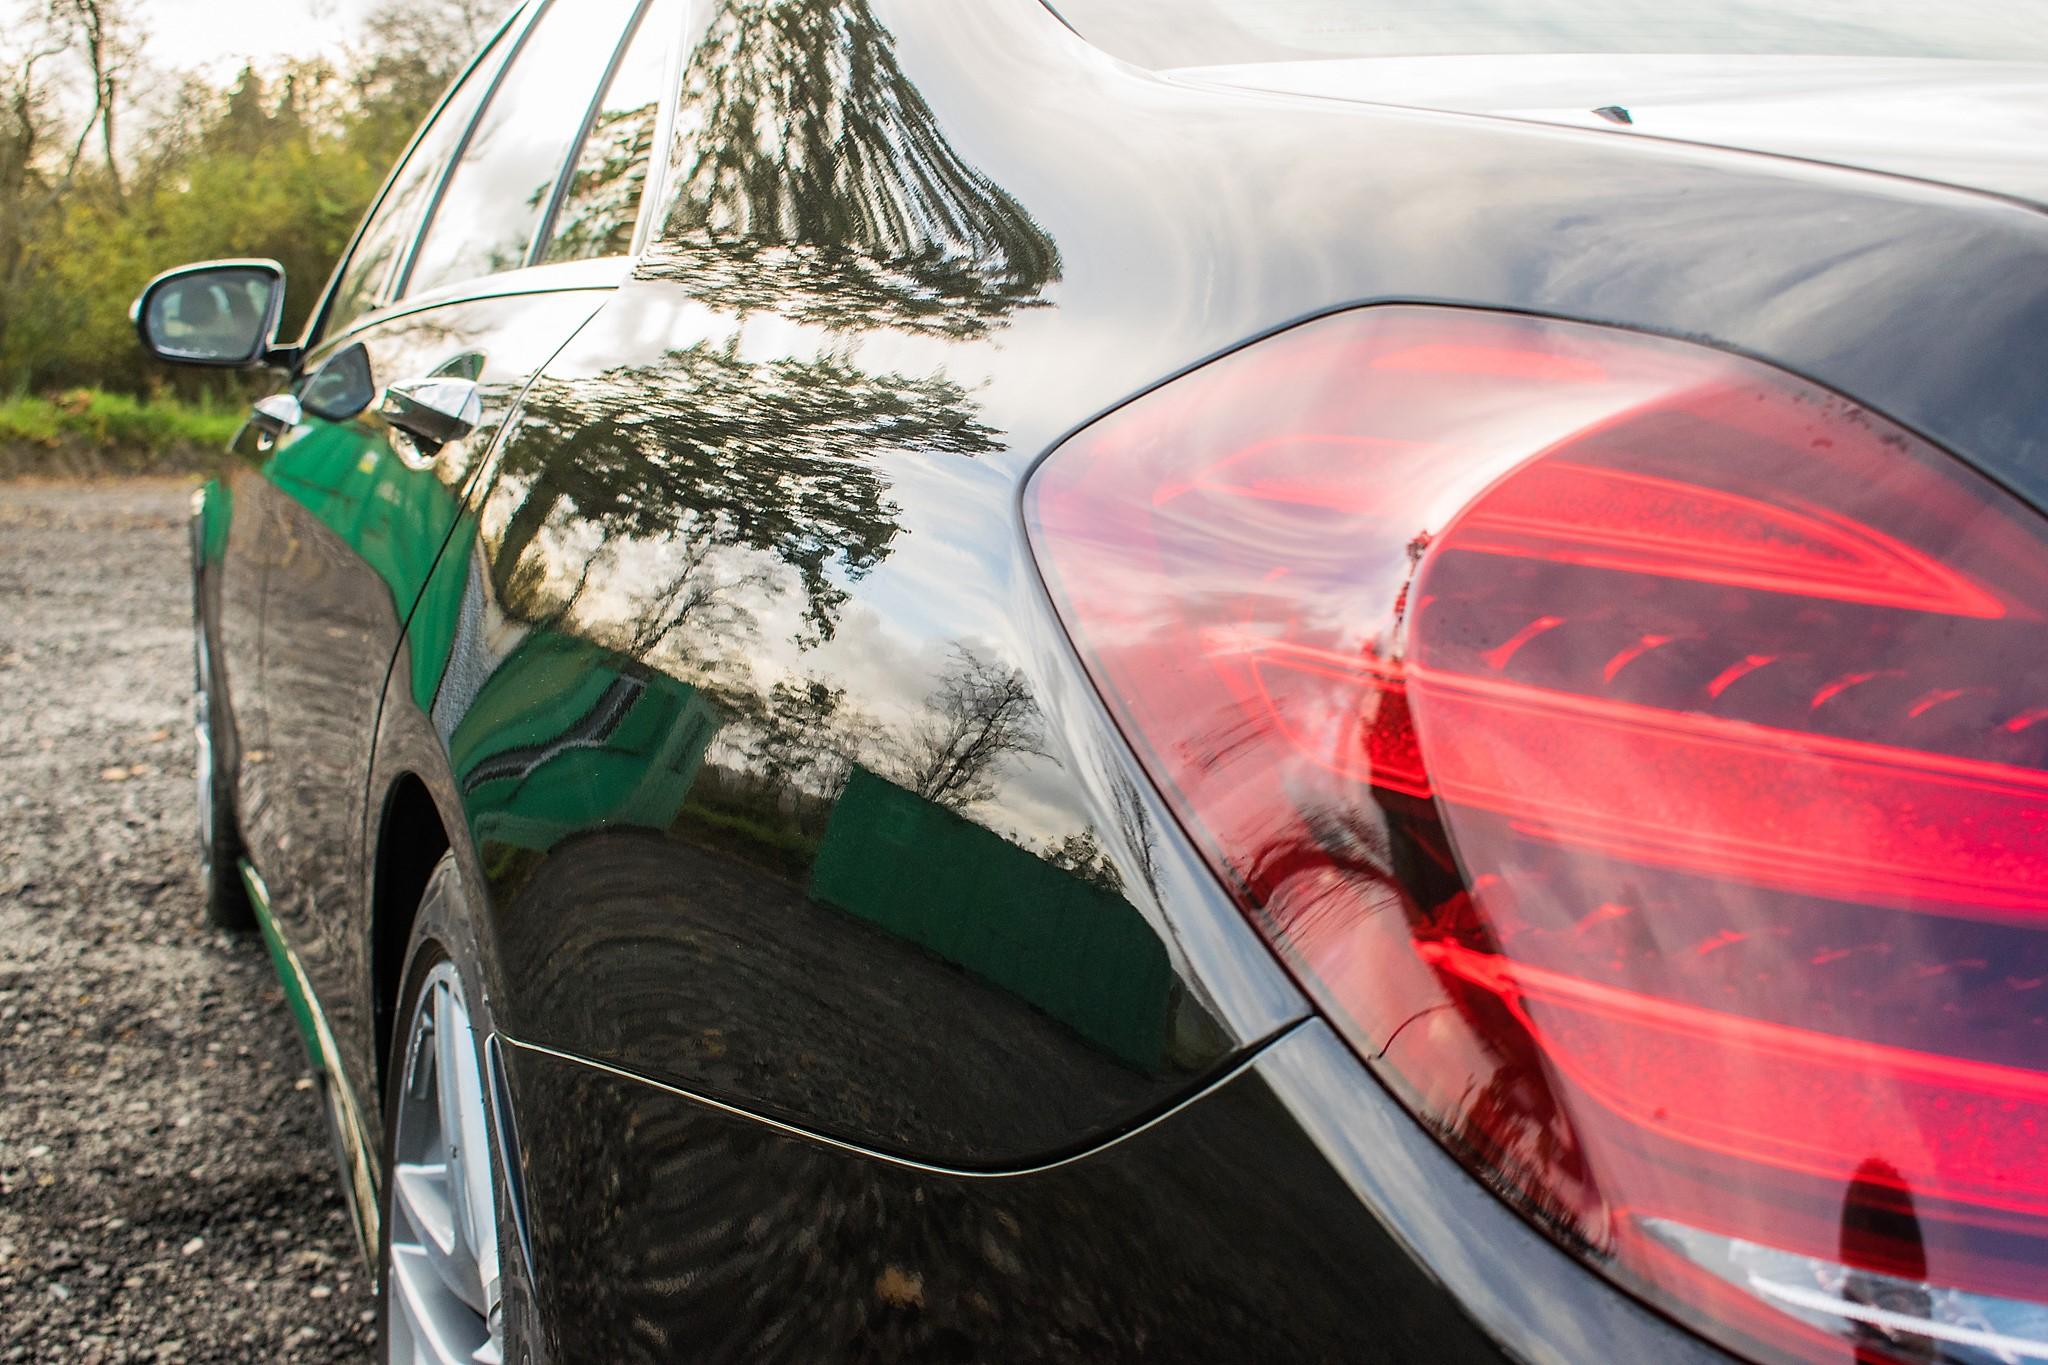 Mercedes Benz S450 L AMG Line Executive auto petrol 4 door saloon car Registration Number: FX68 - Image 14 of 33